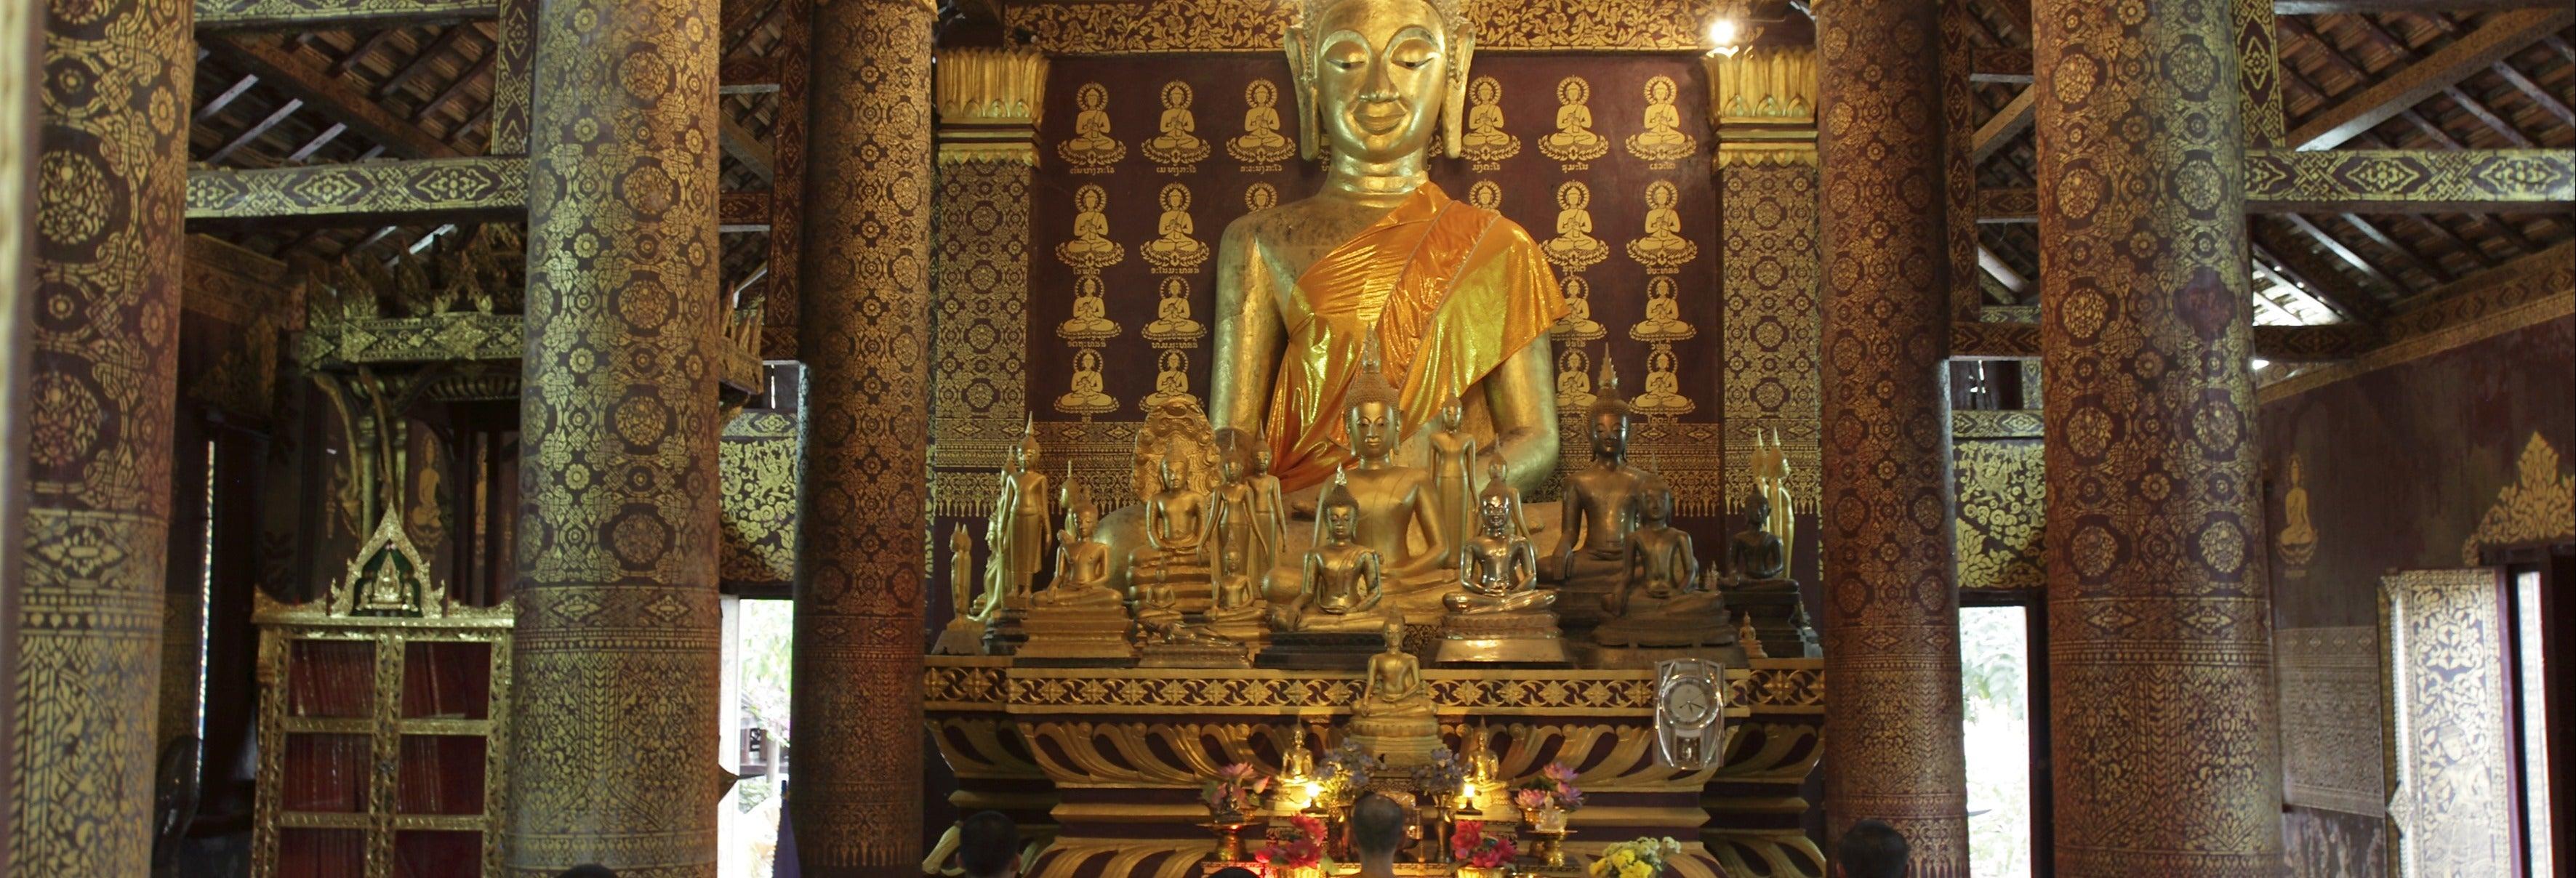 Visita guiada por Luang Prabang